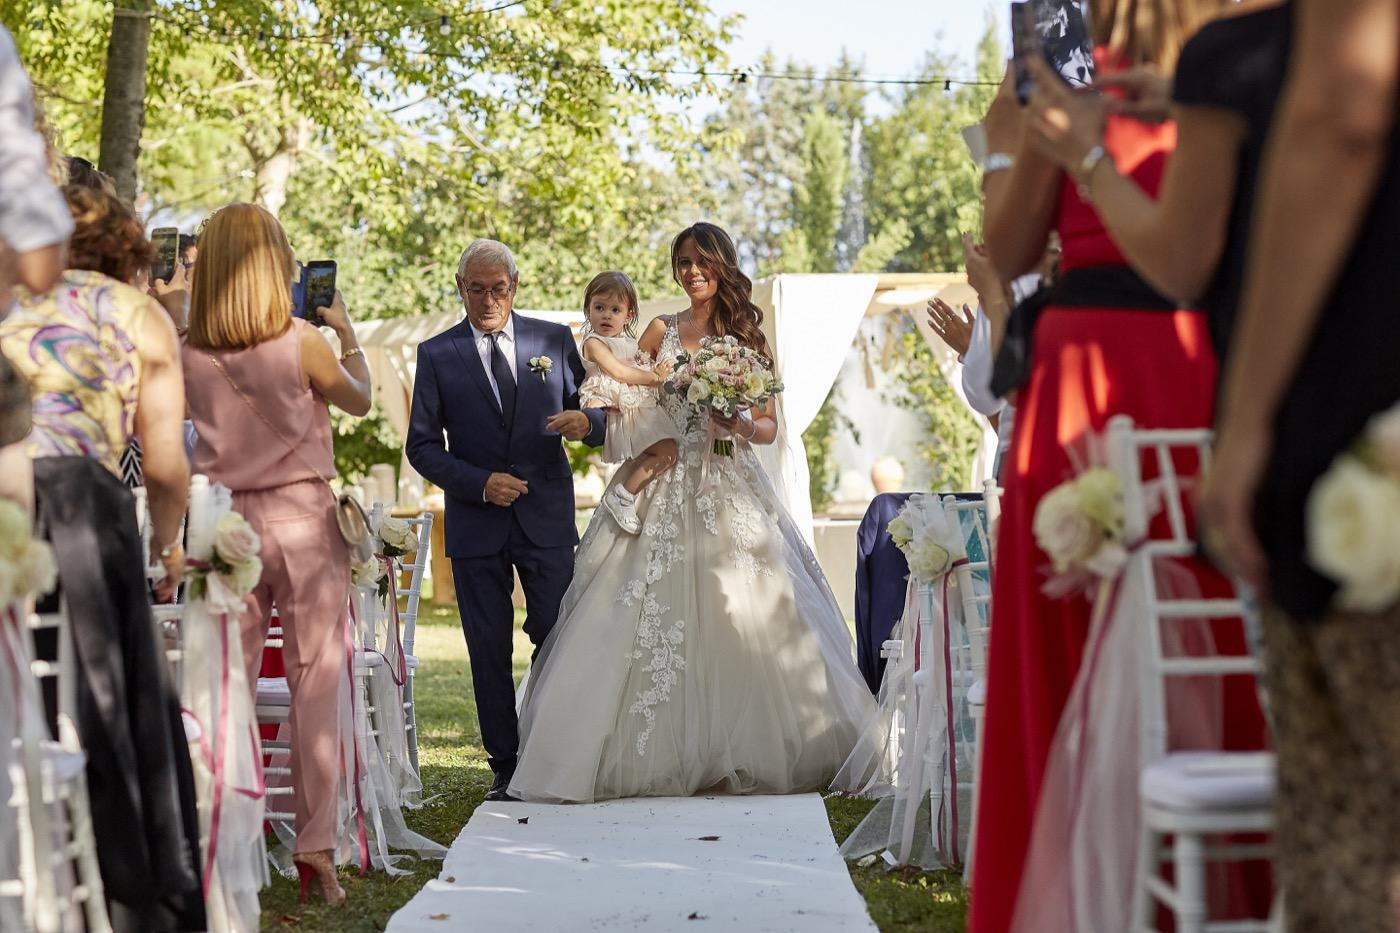 Claudio-Coppola-wedding-photographer-la-scuderia-eventi-preparativi-la-rosetta-perugia-46